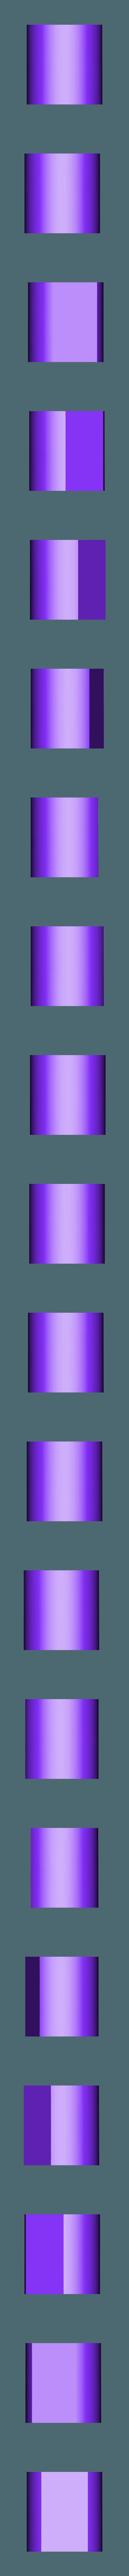 Bottom_Barrell_Plug.stl Télécharger fichier STL gratuit Borderlands Bandit Room Clener Shotgun • Modèle pour impression 3D, Dsk